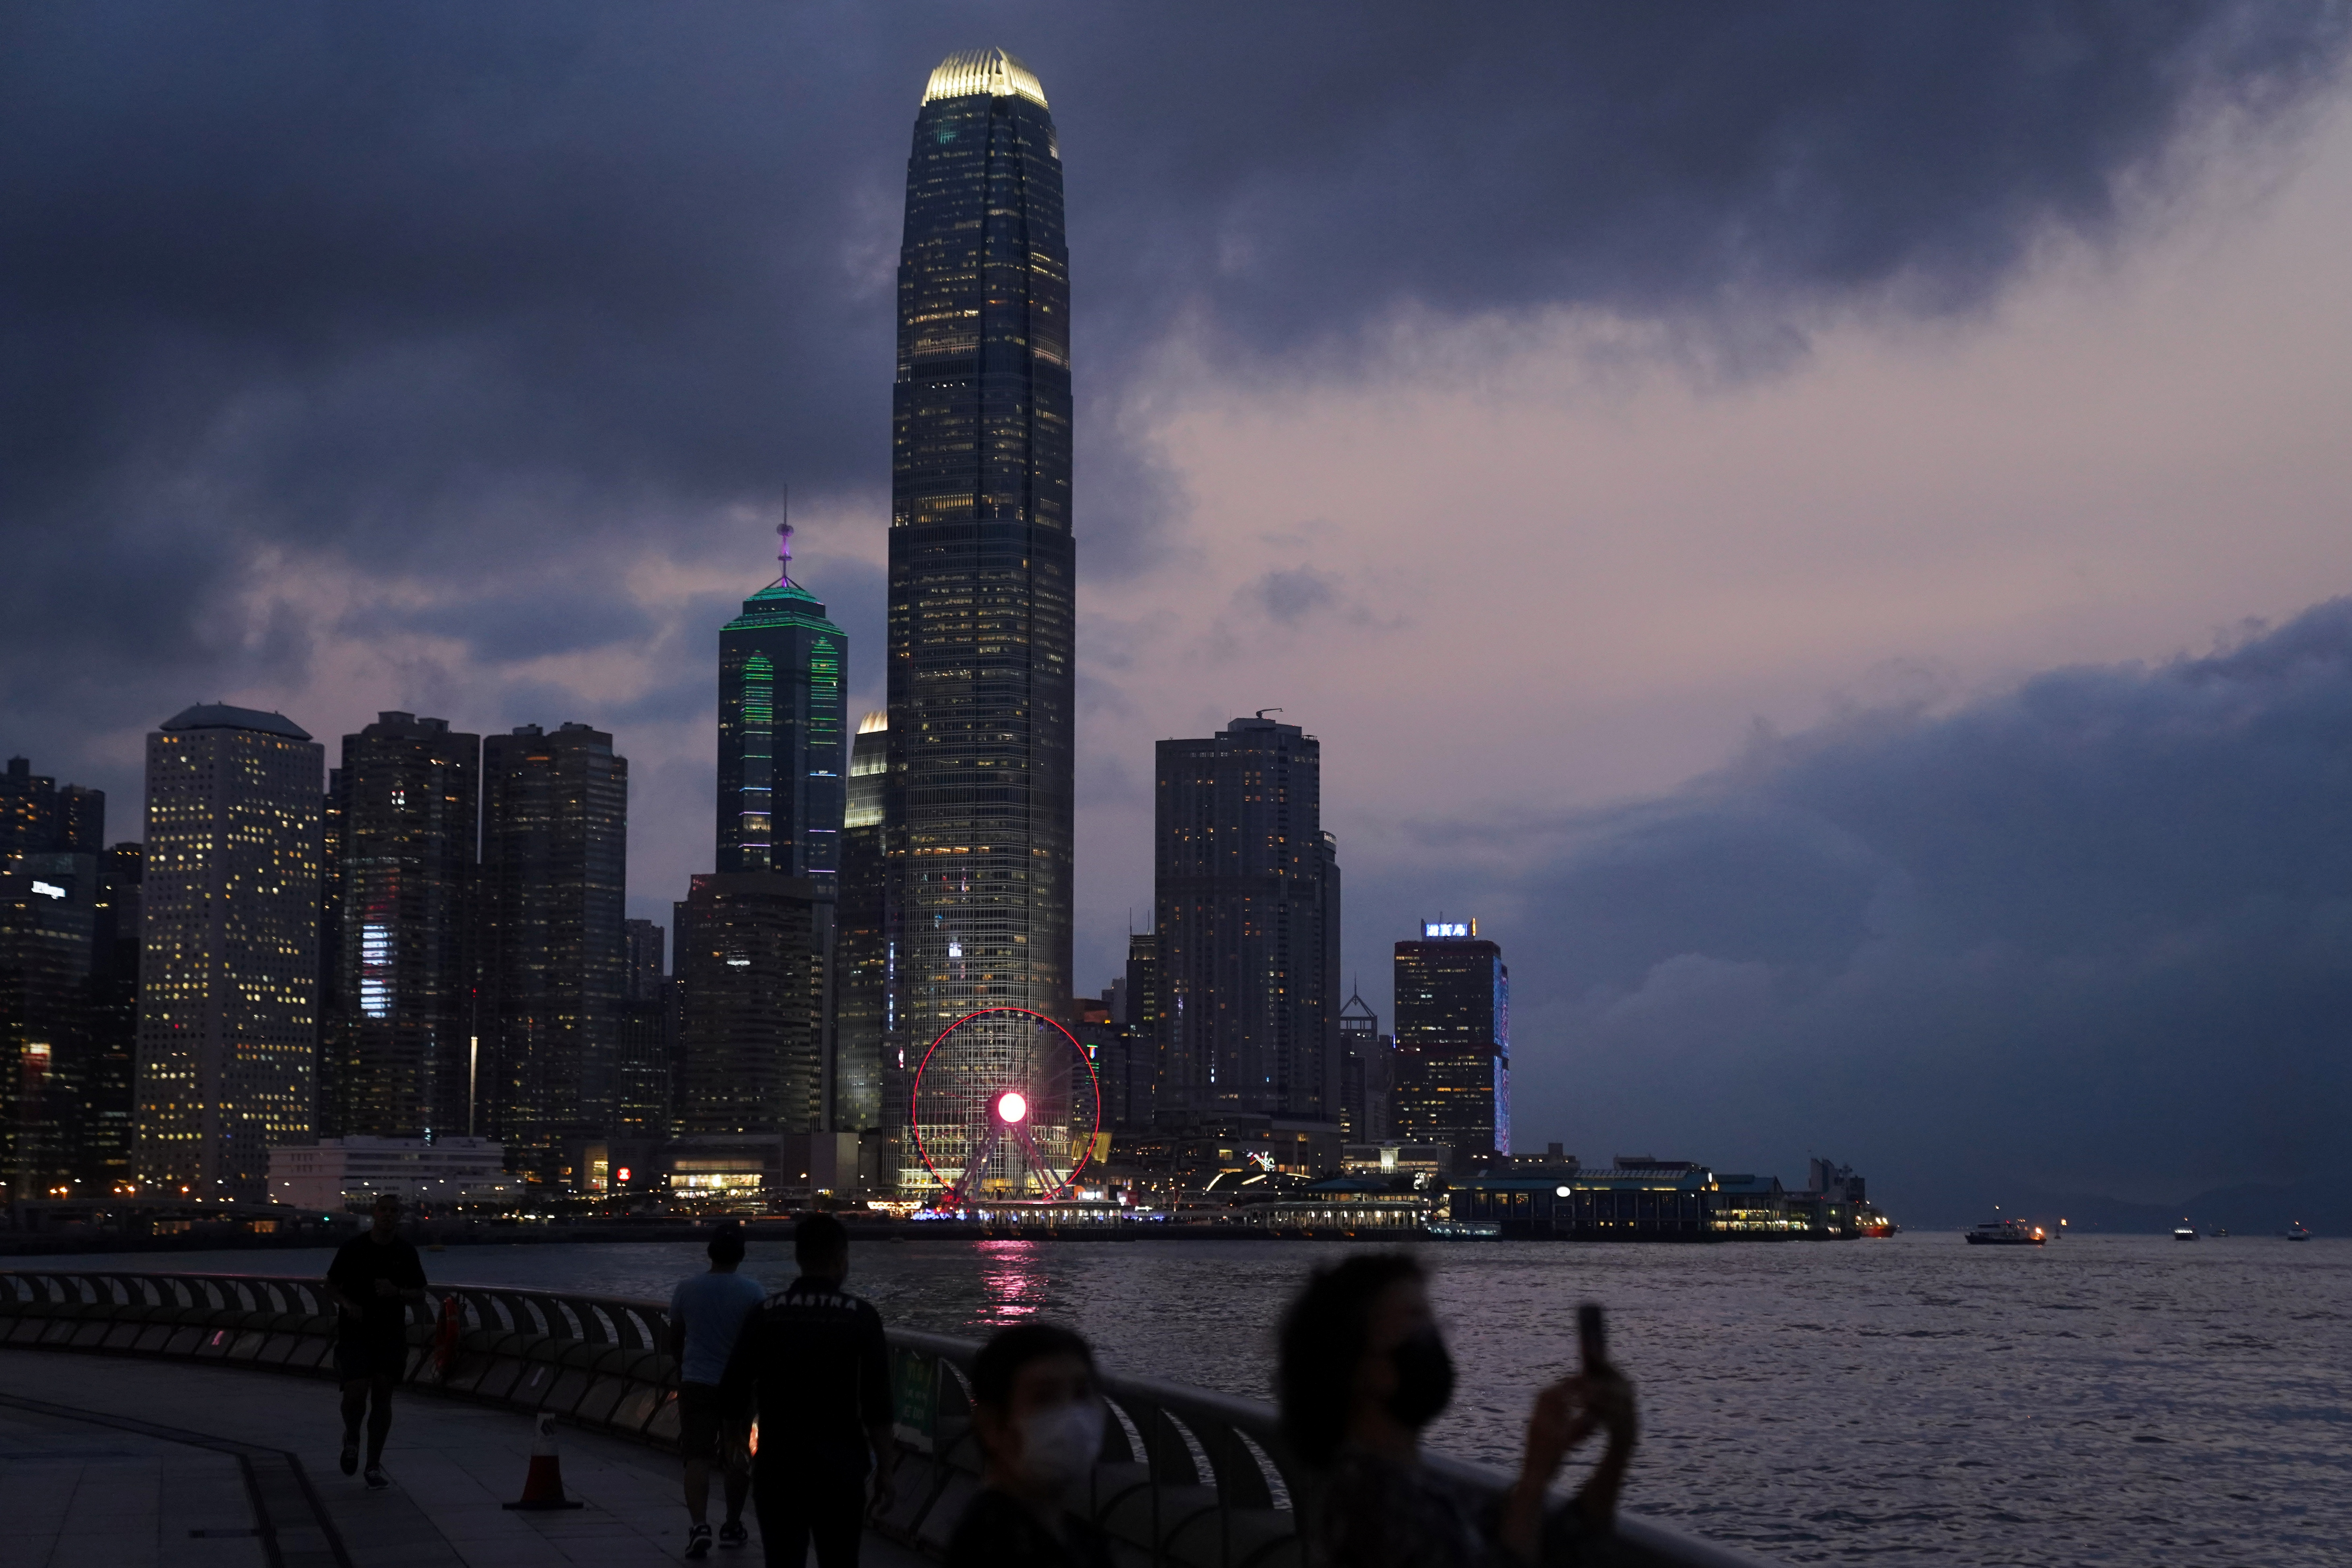 Top execs of HK financial firms can get quarantine exemption